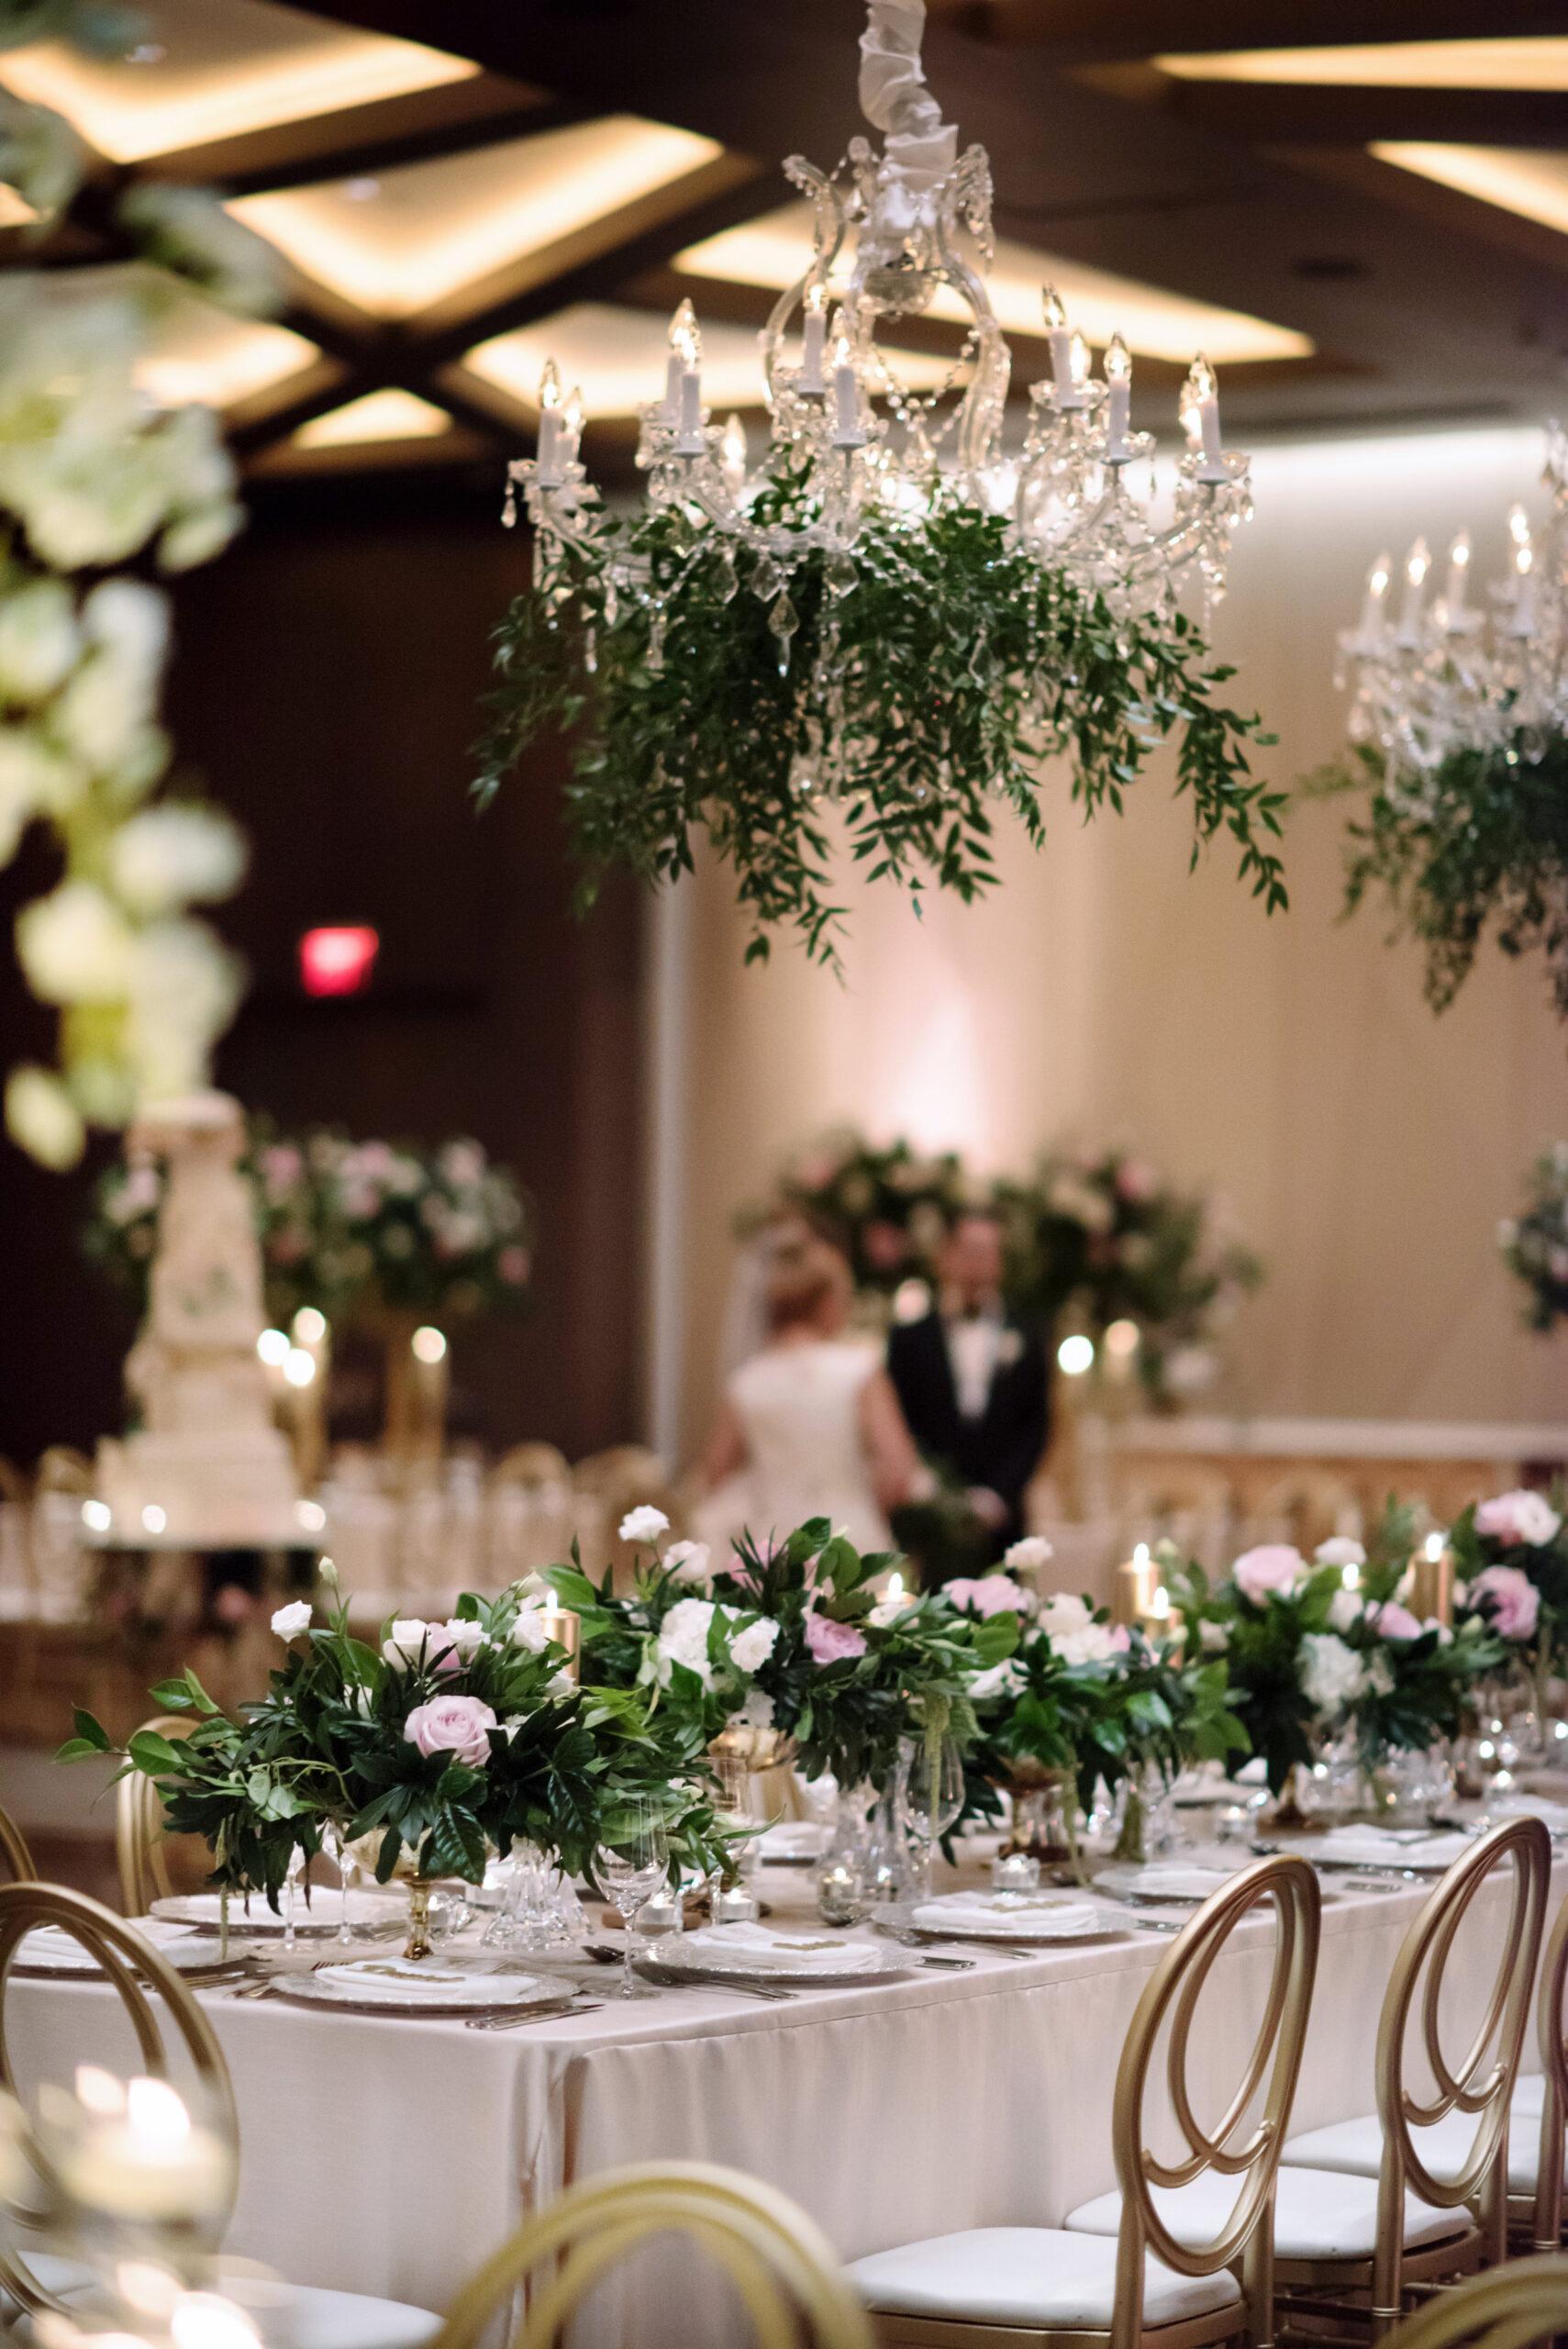 https://secureservercdn.net/45.40.145.151/kgq.ab5.myftpupload.com/wp-content/uploads/2020/04/Sanam-Soroush-s-Wedding-wedluxe-submission-0076-scaled.jpg?time=1606414923